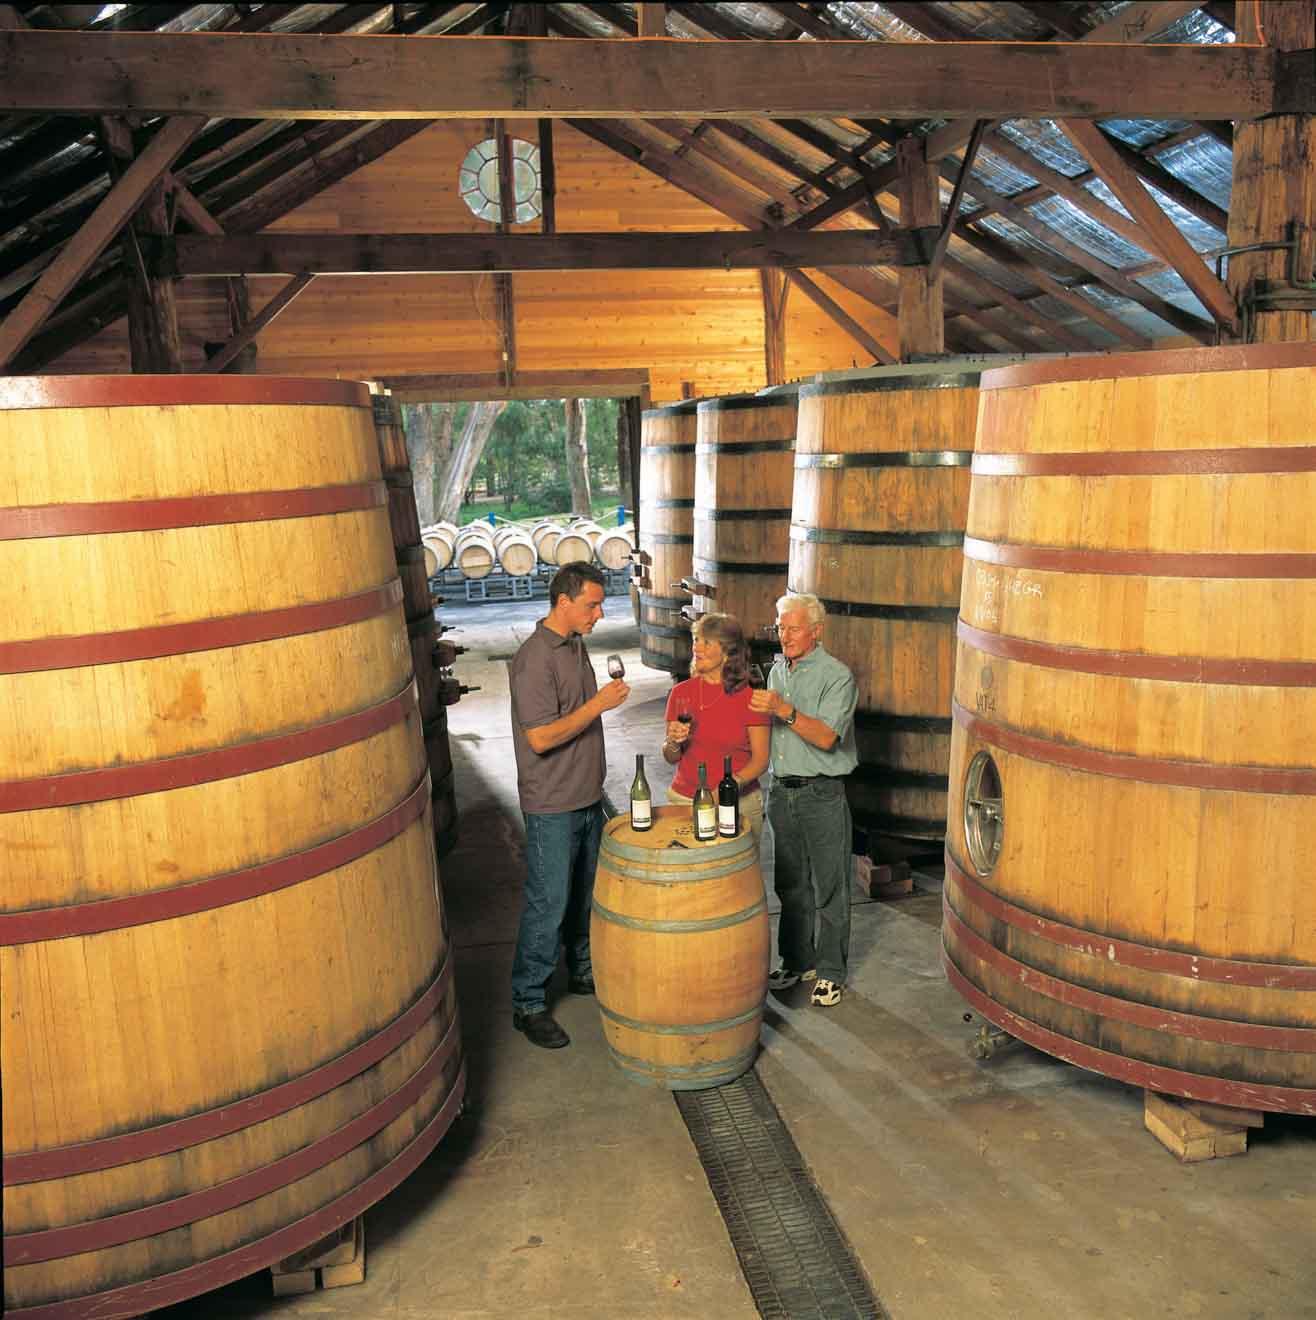 Cosas que hacer en Western SA, Cape Mentelle Margaret River Wineries Winery